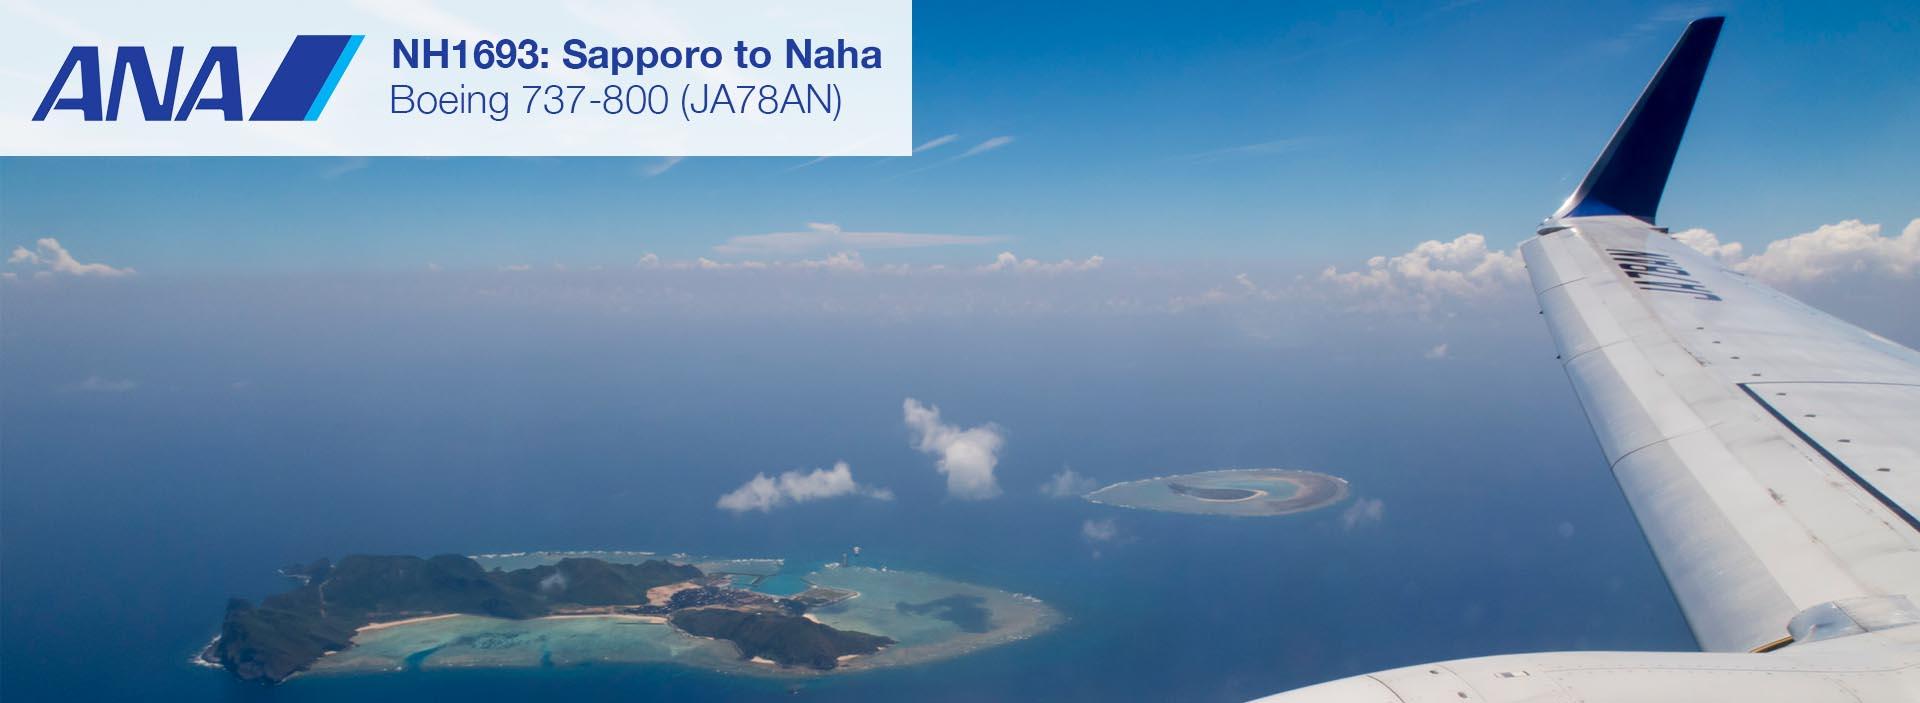 ANA Boeing 737-800 Domestic Economy Class Review (Sapporo - Naha)